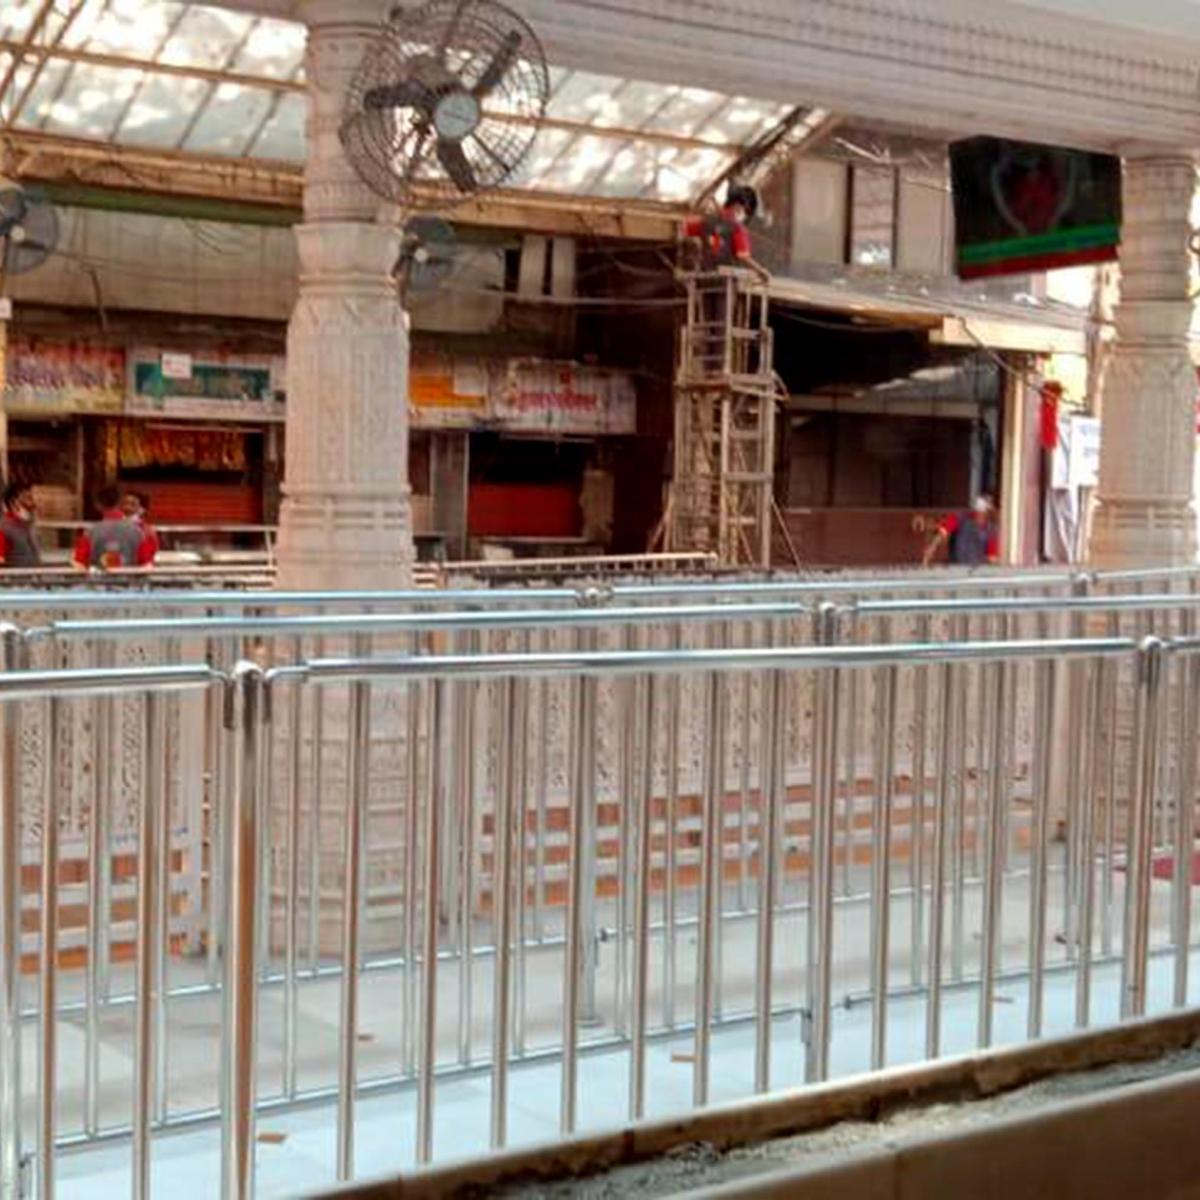 Mumbai: Businessmen outside temples suffer loss